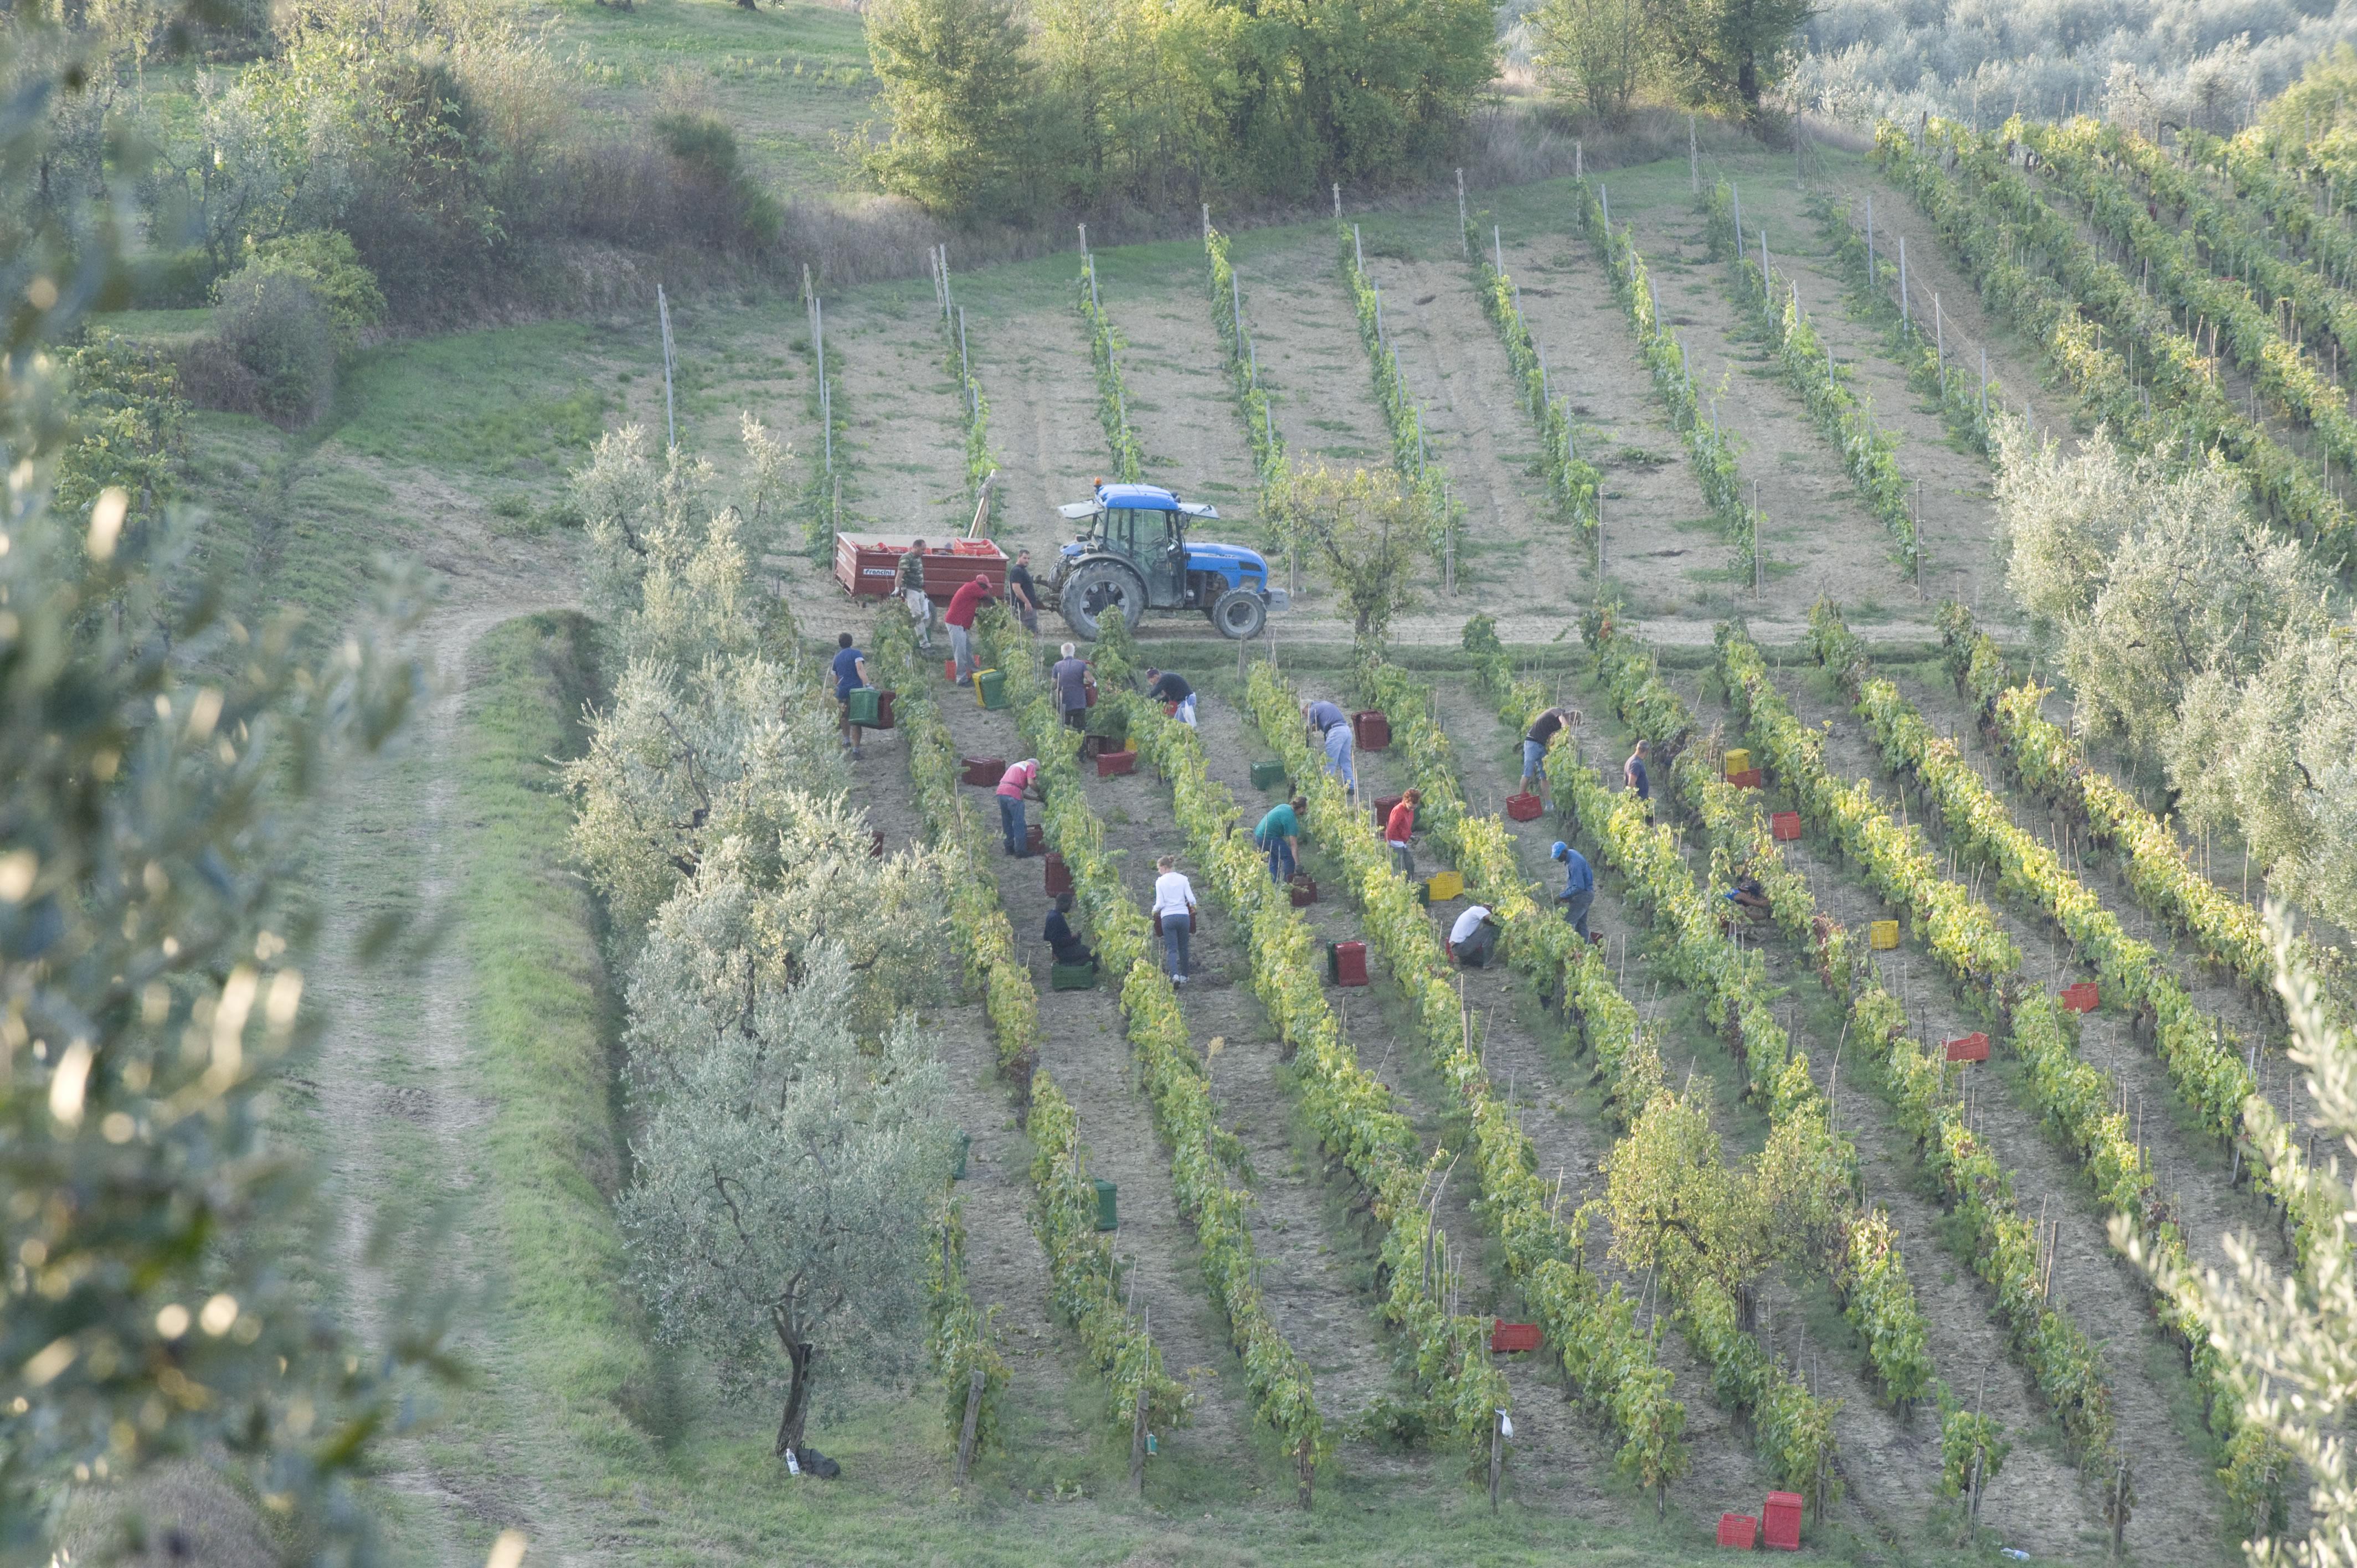 Poggiotando Toscana